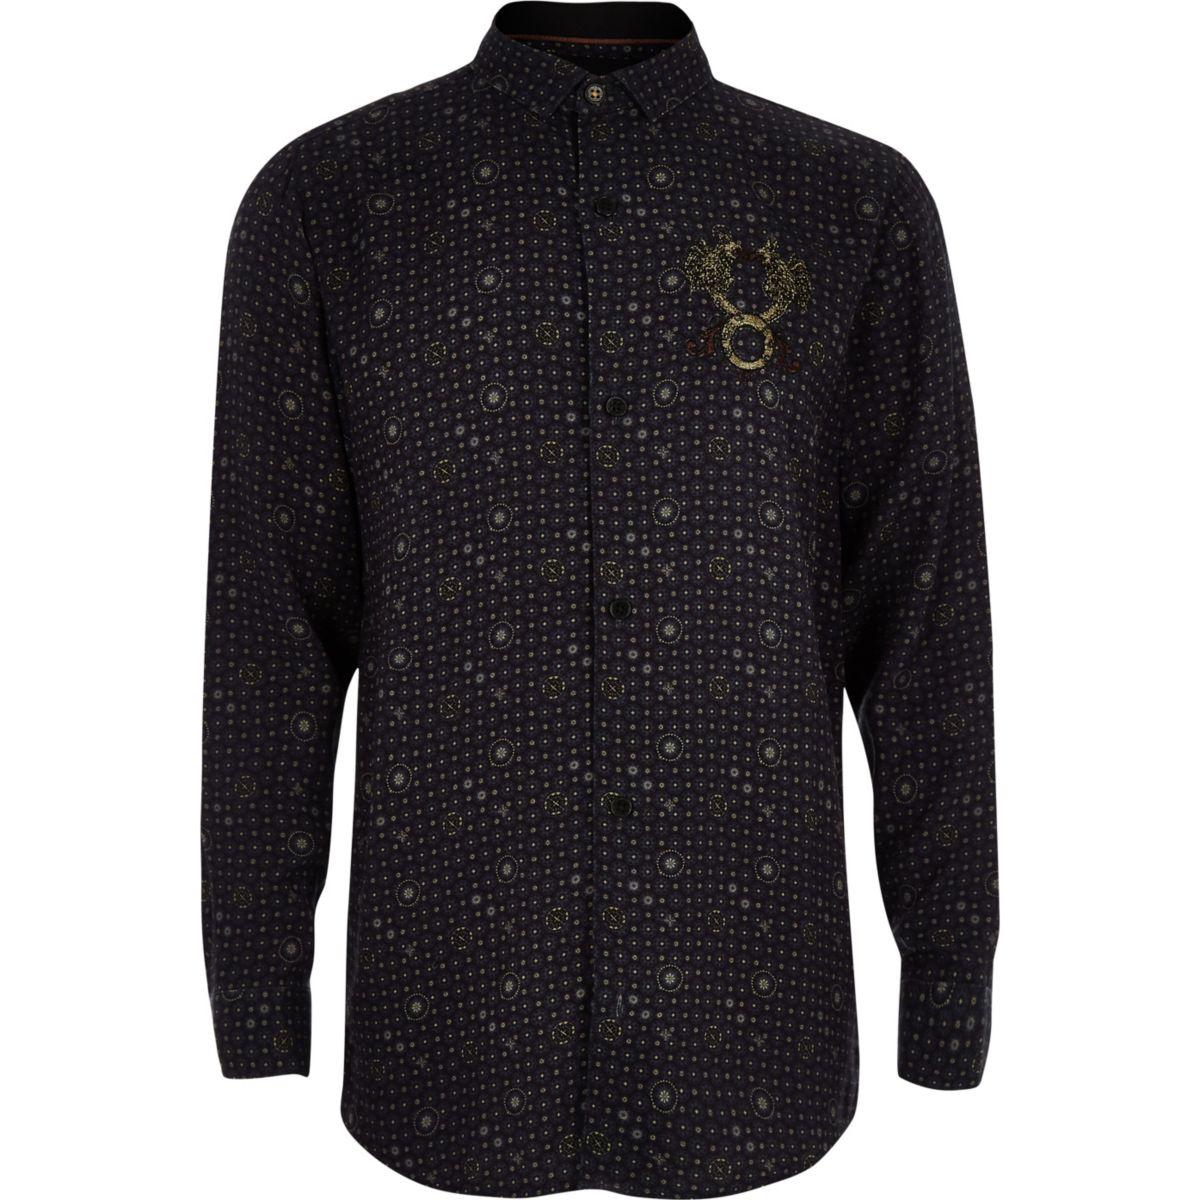 RI 30 boys navy tile print shirt